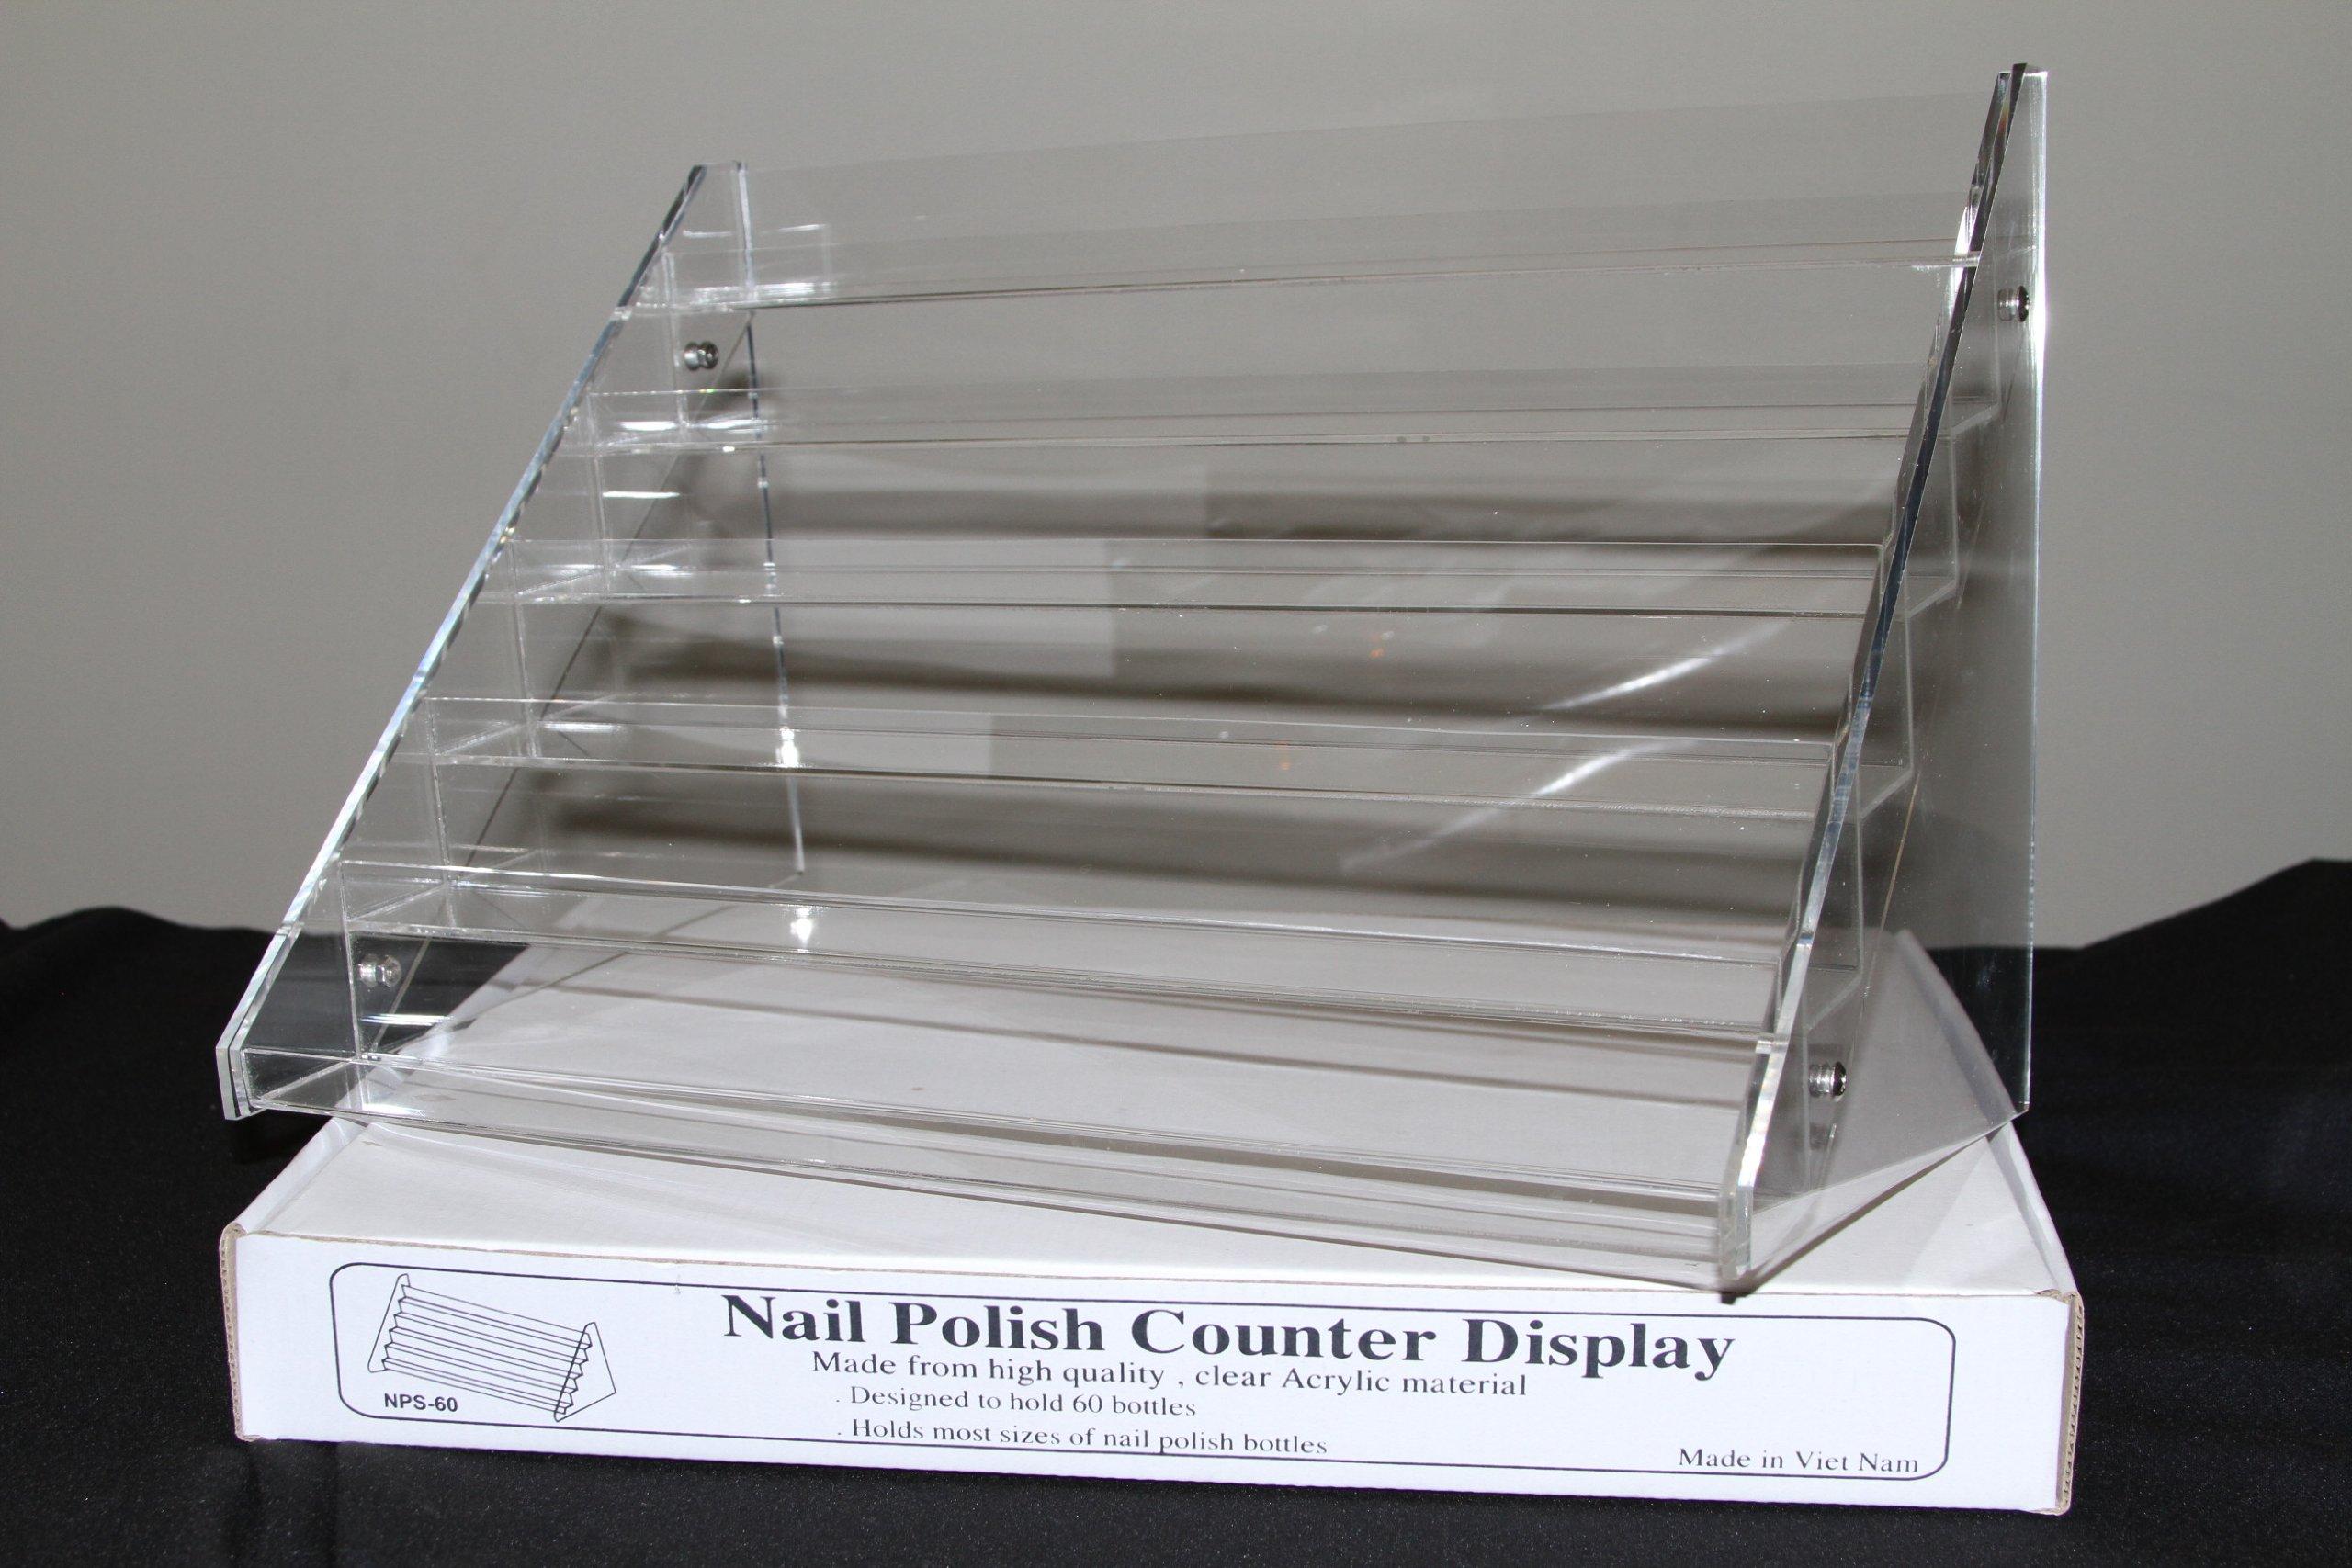 Beauticom Nail Polish Table Rack Display (Hold Up To 60 Bottles)